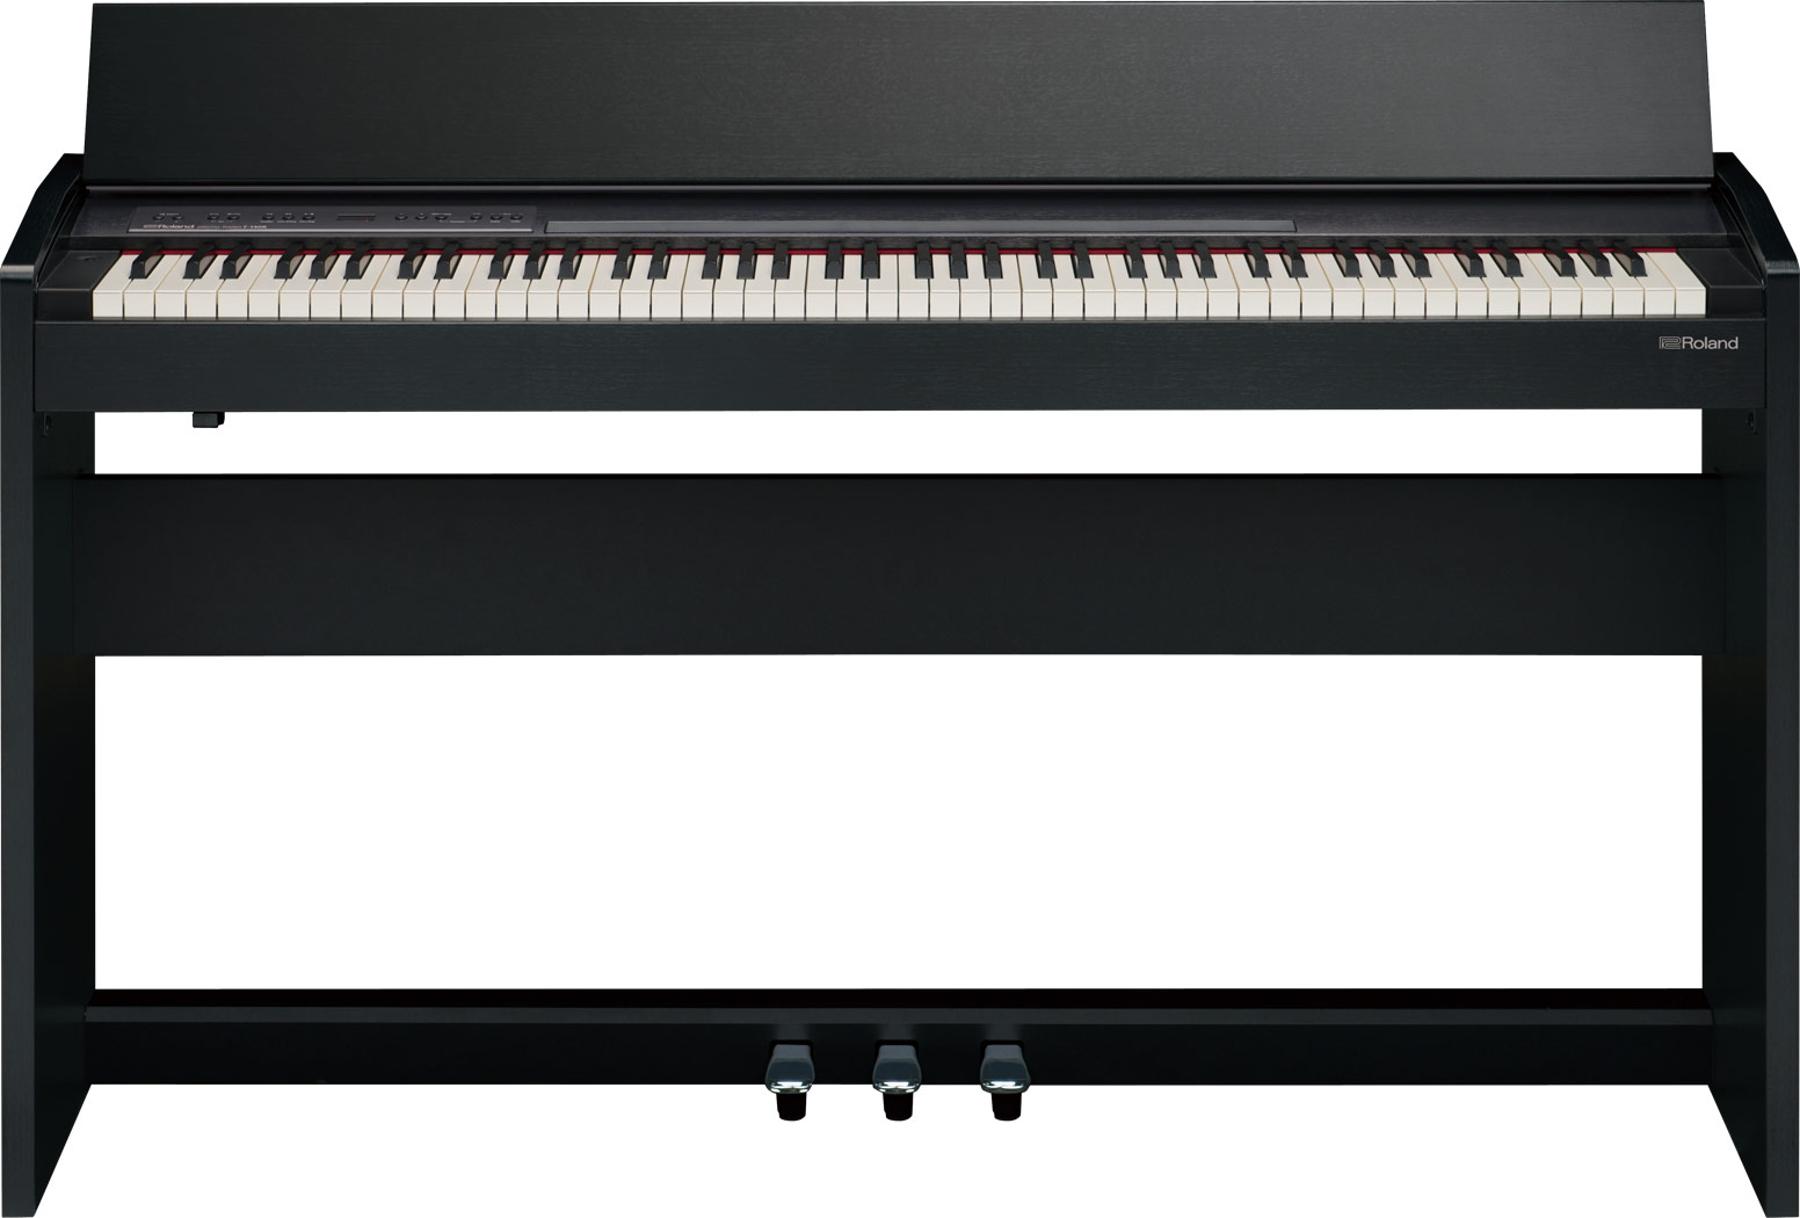 88 Key Compact Digital Piano in Black